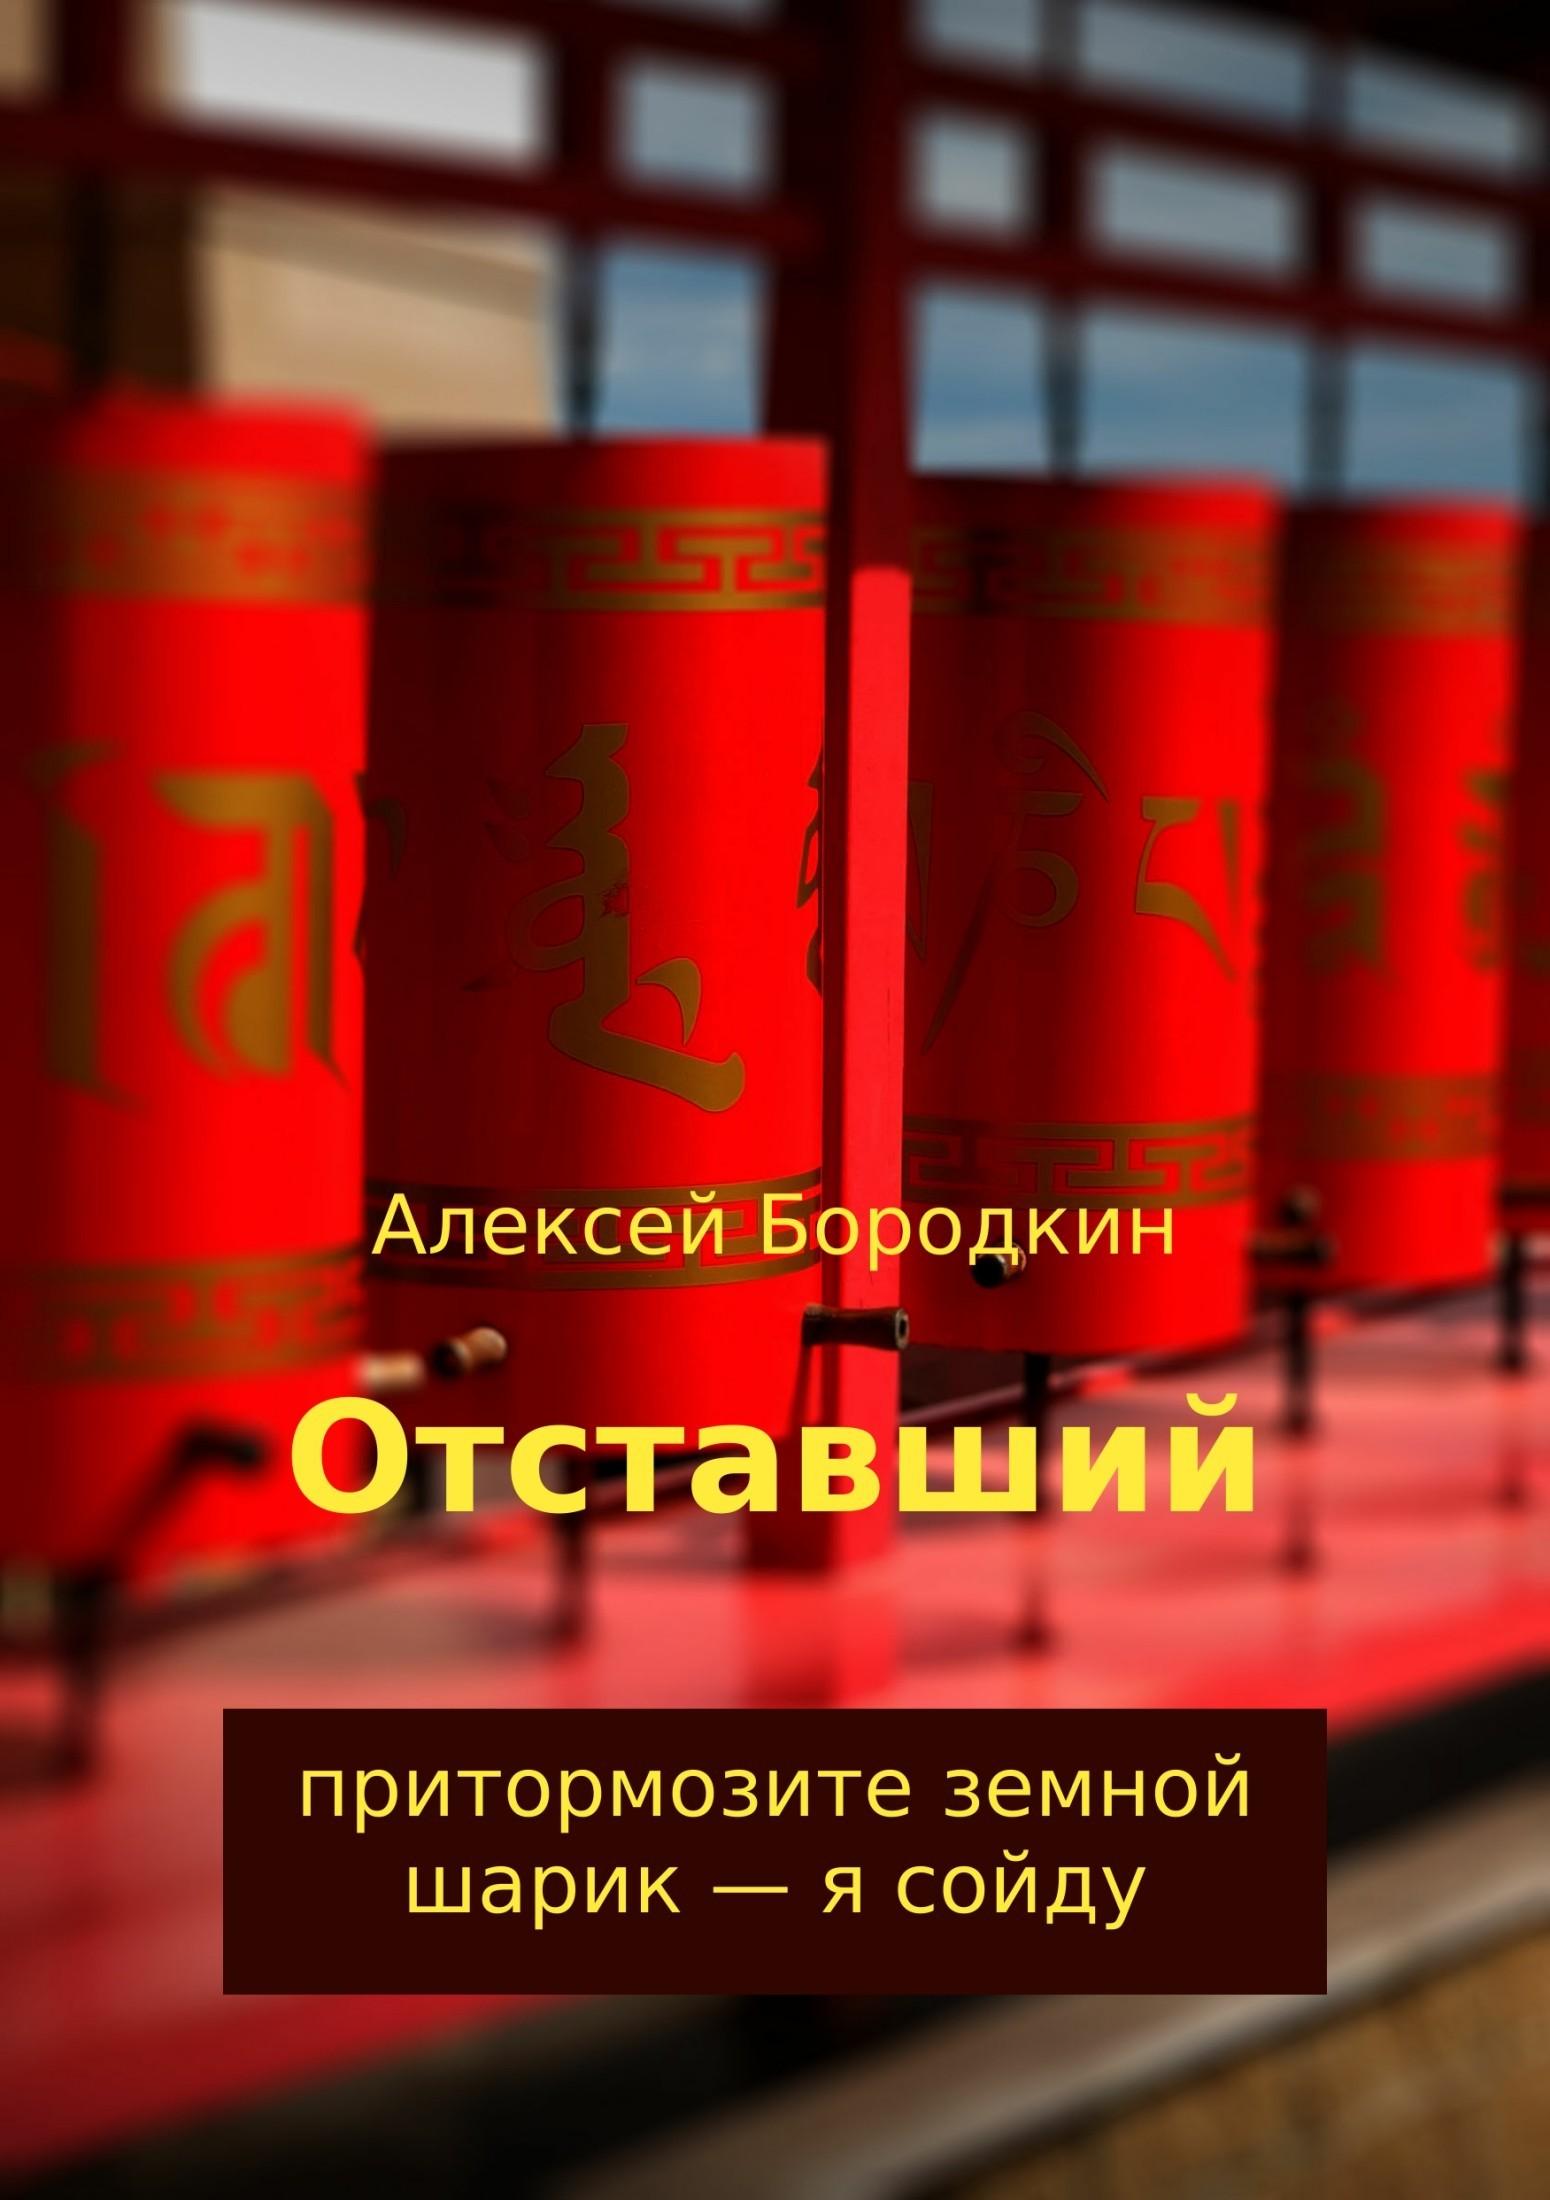 Алексей Бородкин - Отставший